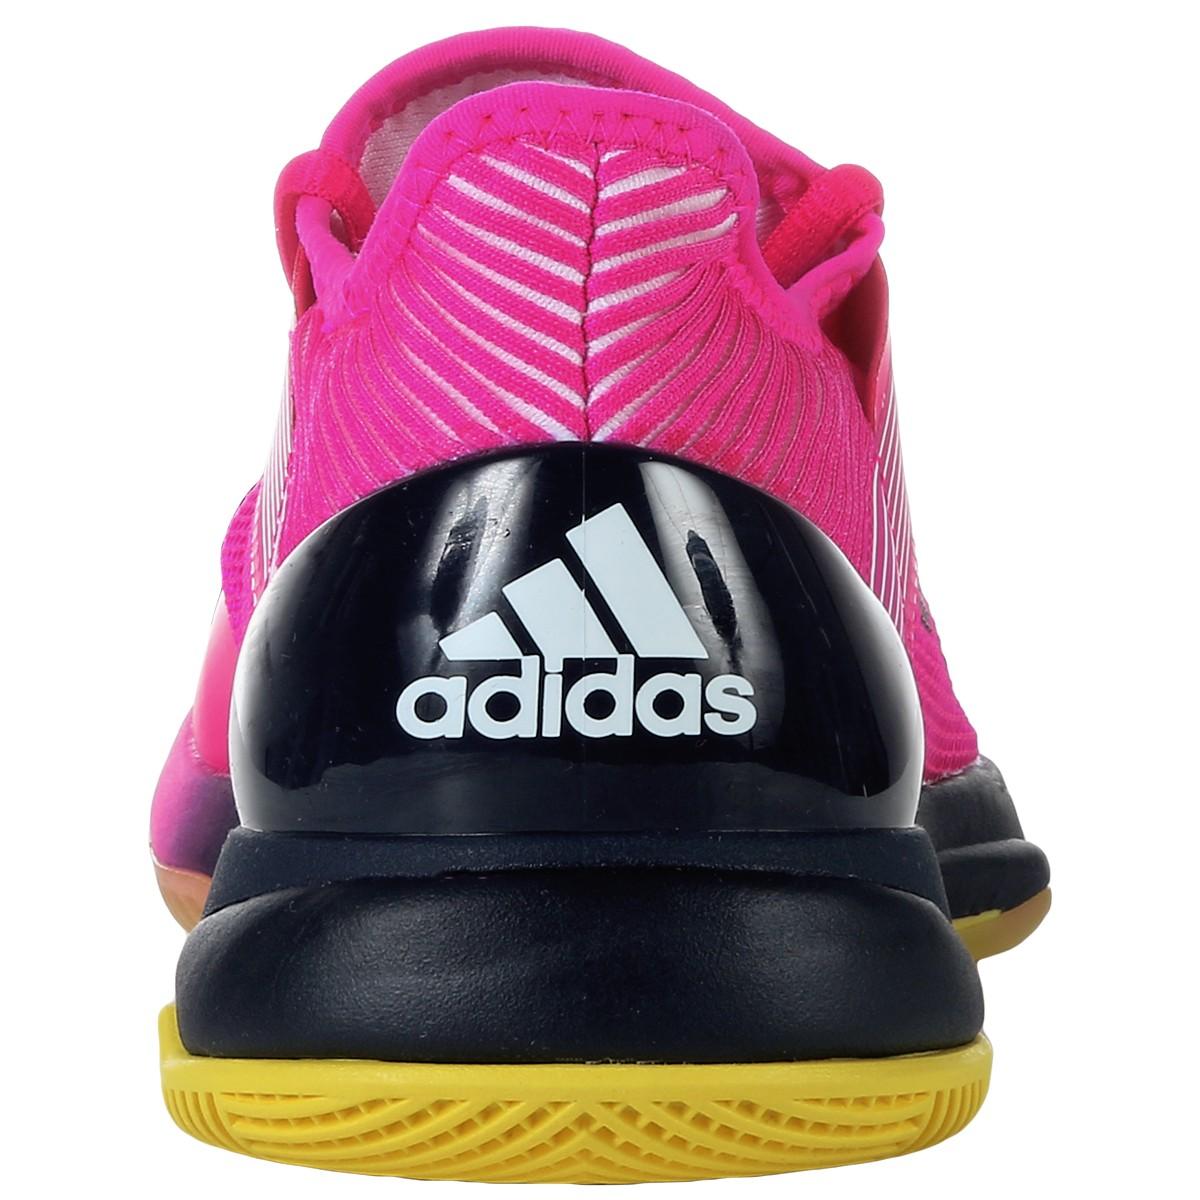 Adizero Chaussures Adidas 3 Surfaces Toutes Femme Ubersonic 2DW9EHI